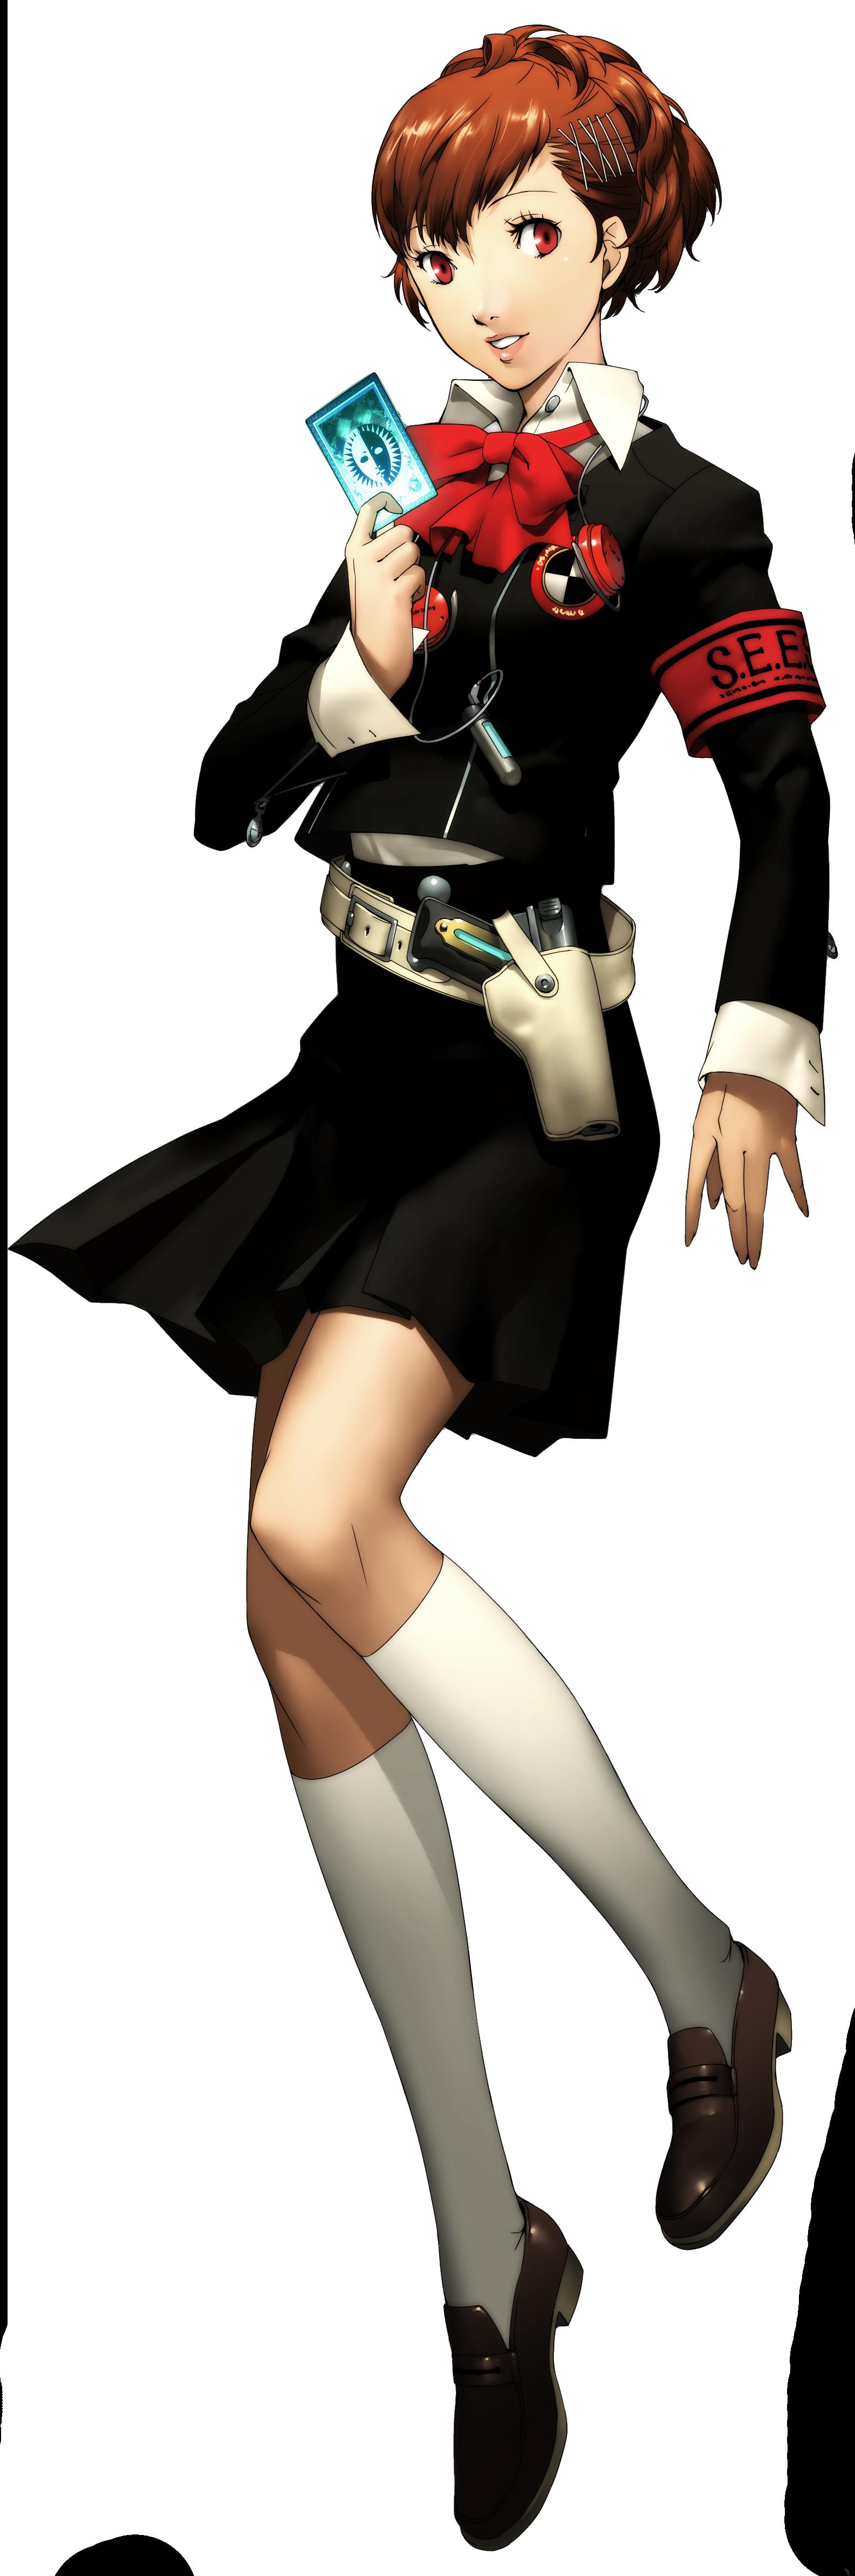 Female protagonist (Persona 3 Portable) | Megami Tensei Wiki